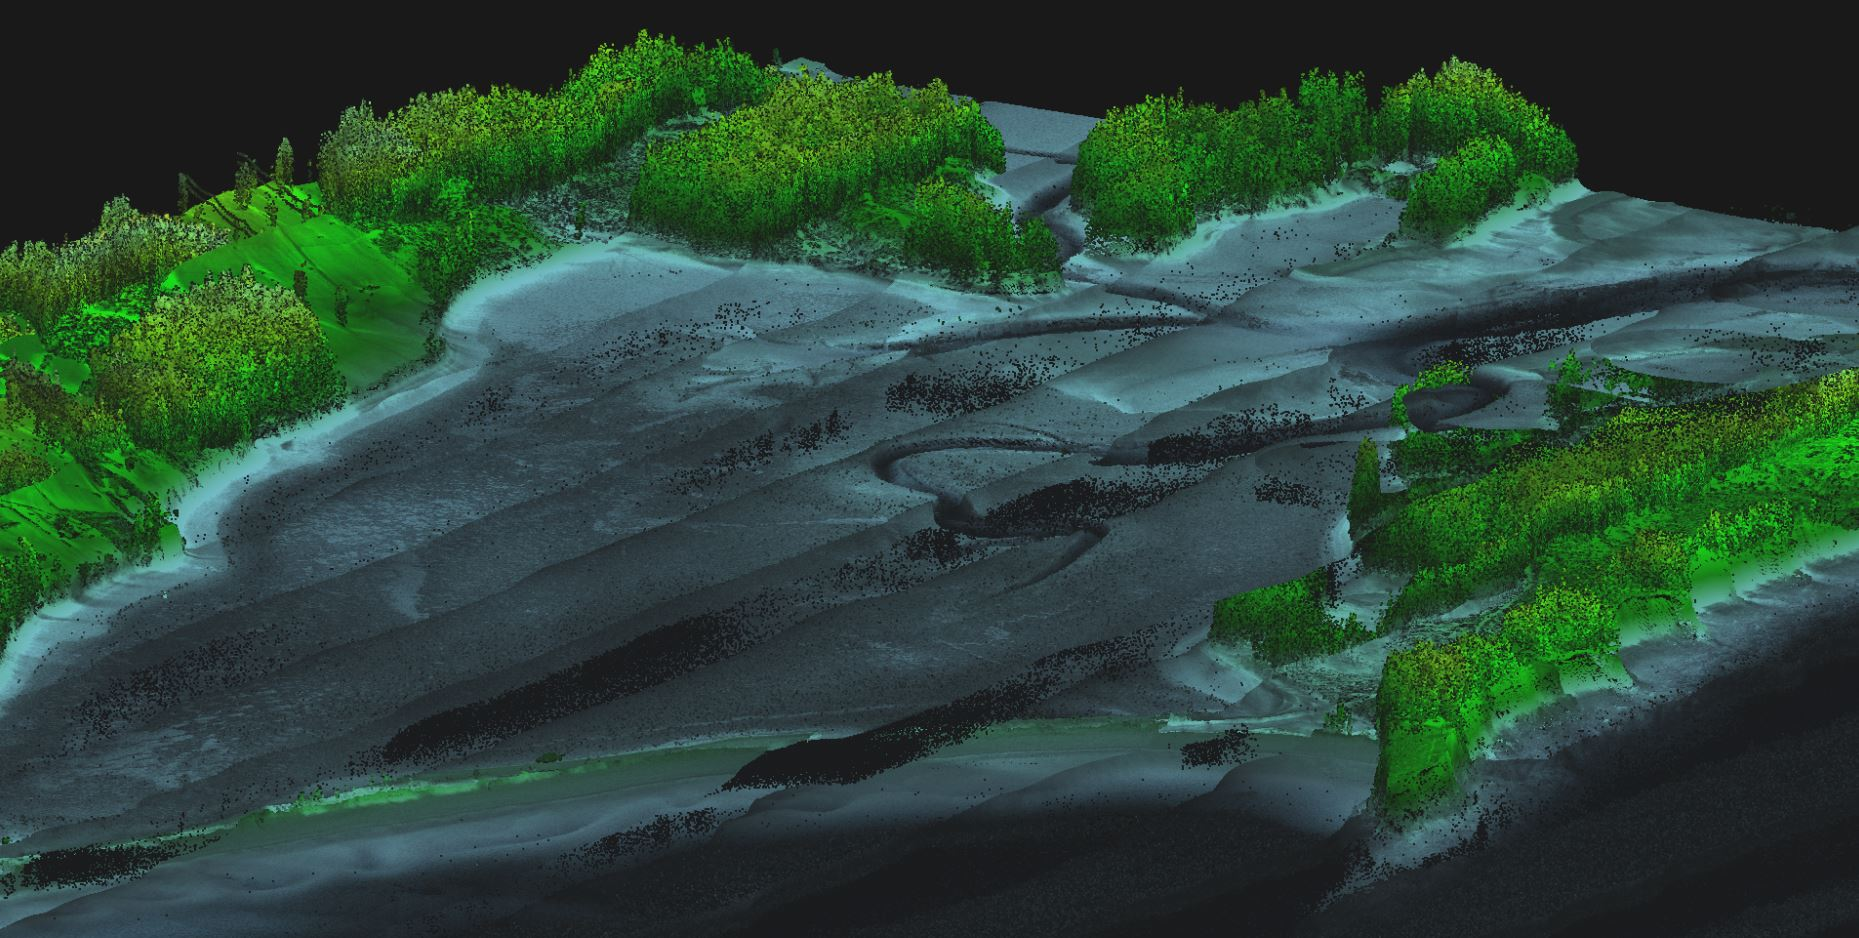 Bathymetric LIDAR - LiDAR Survey Studio smooth constant 3D viewing of LIDAR points